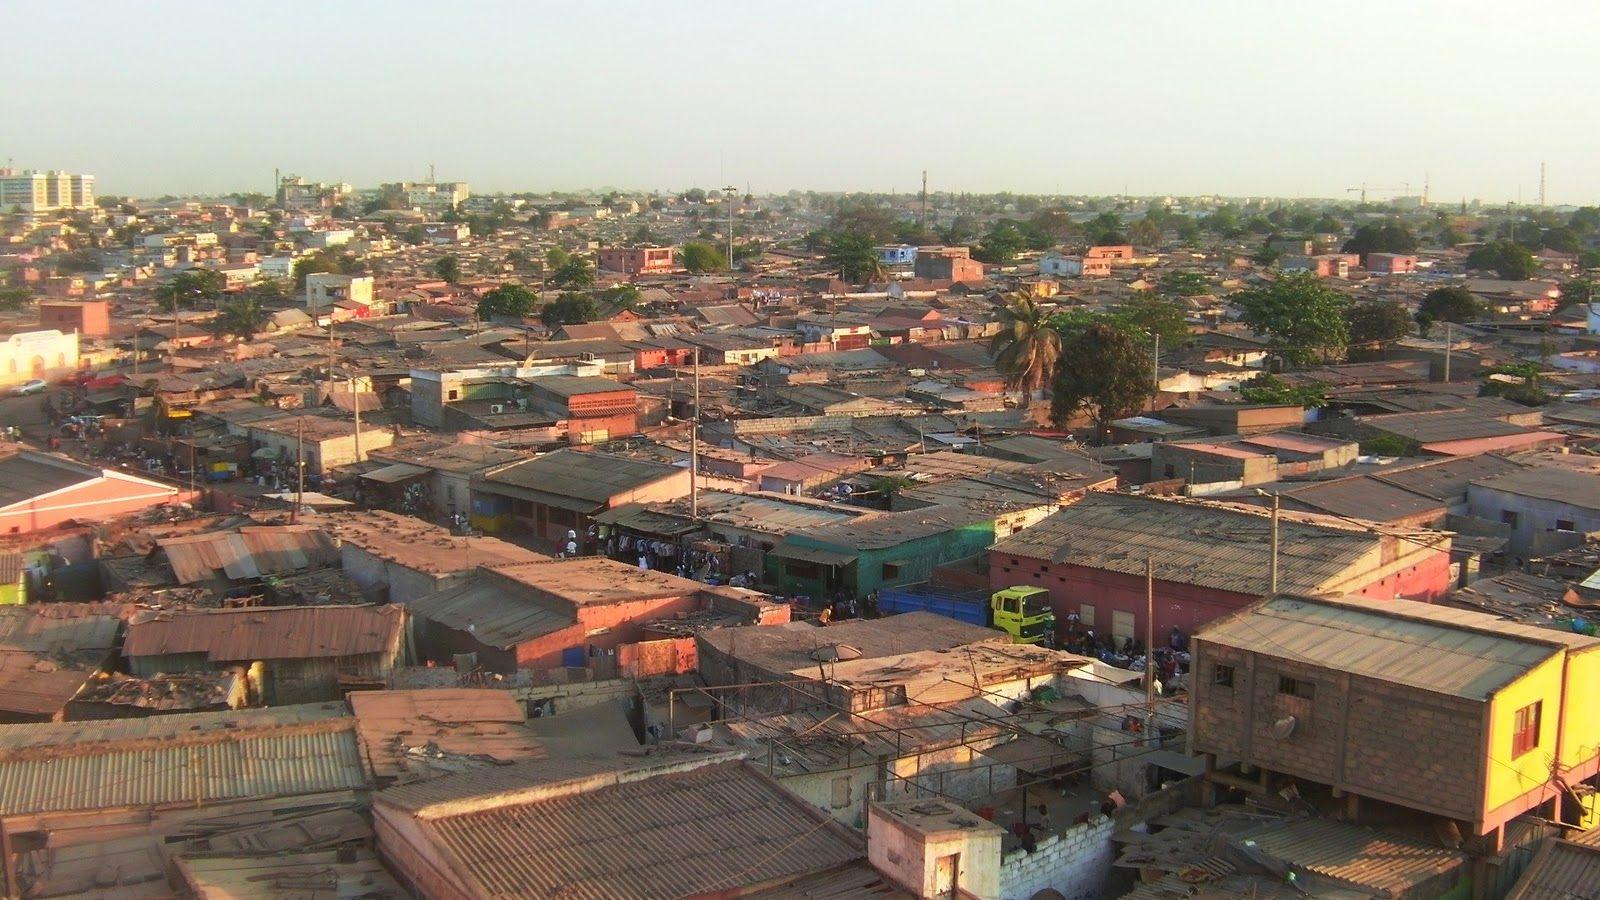 The Roof Above My Head Musseque Sambizanga Luanda Angola In 2020 Visa Online Angola Tourist